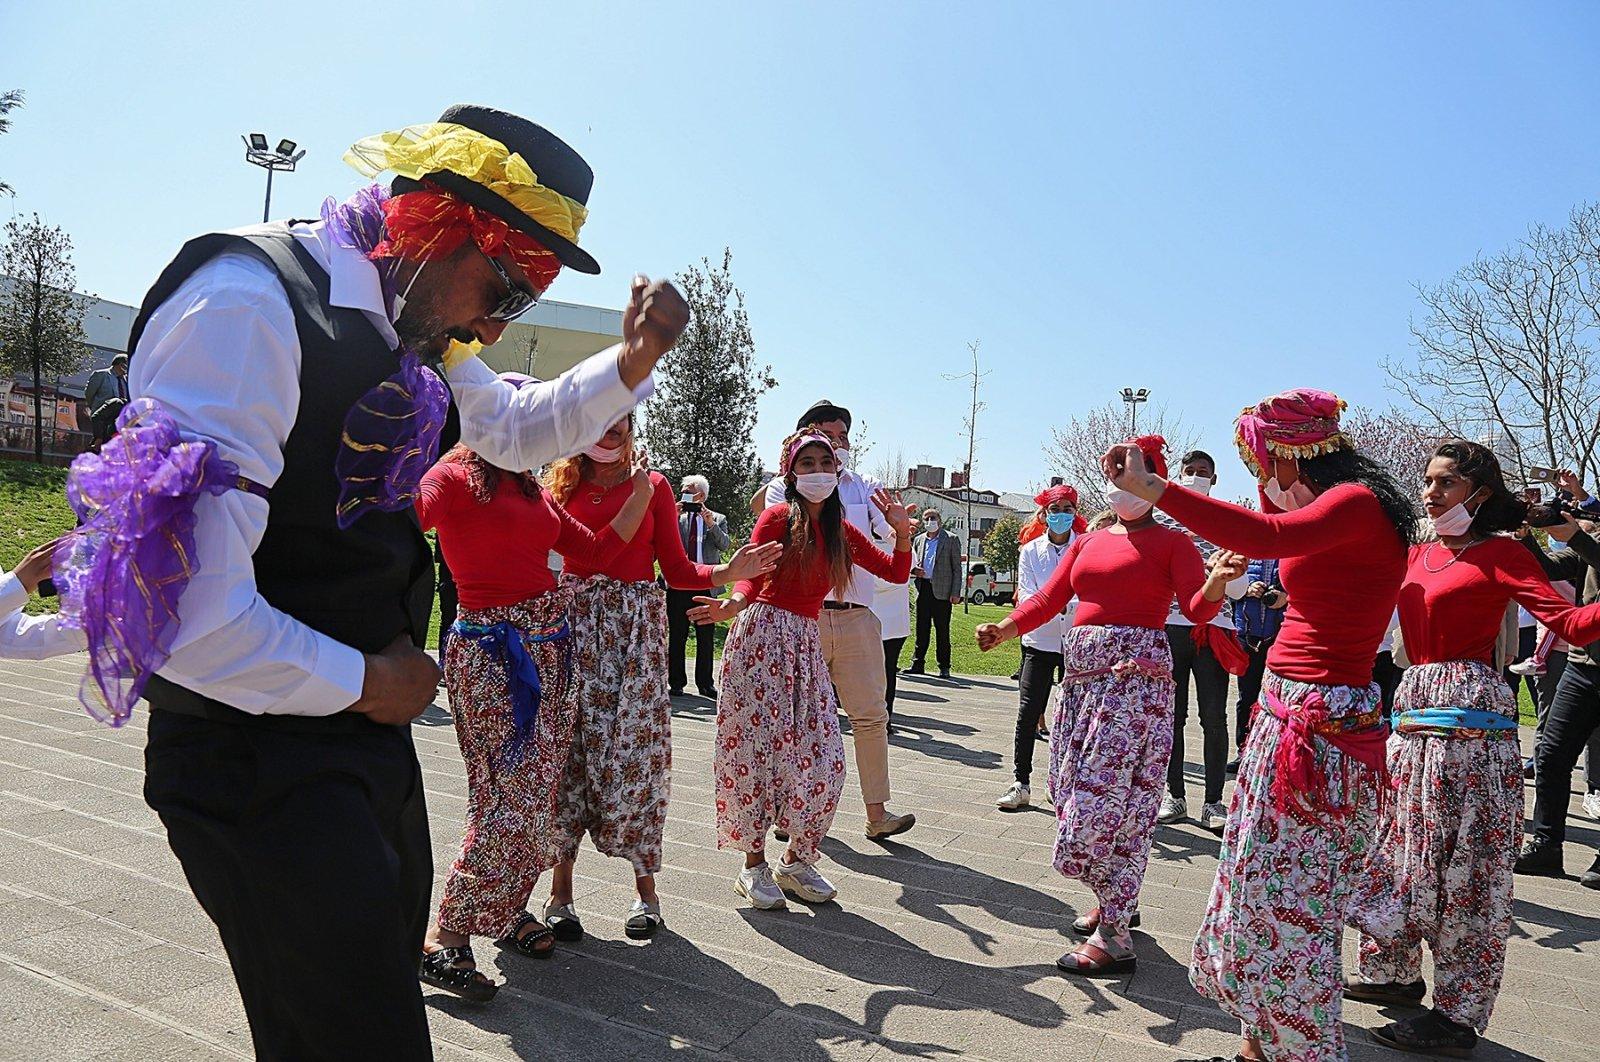 A group of Romani citizens celebrates International Roma Day in Ataşehir district, in Istanbul, Turkey, April 8, 2021. (İHA PHOTO)